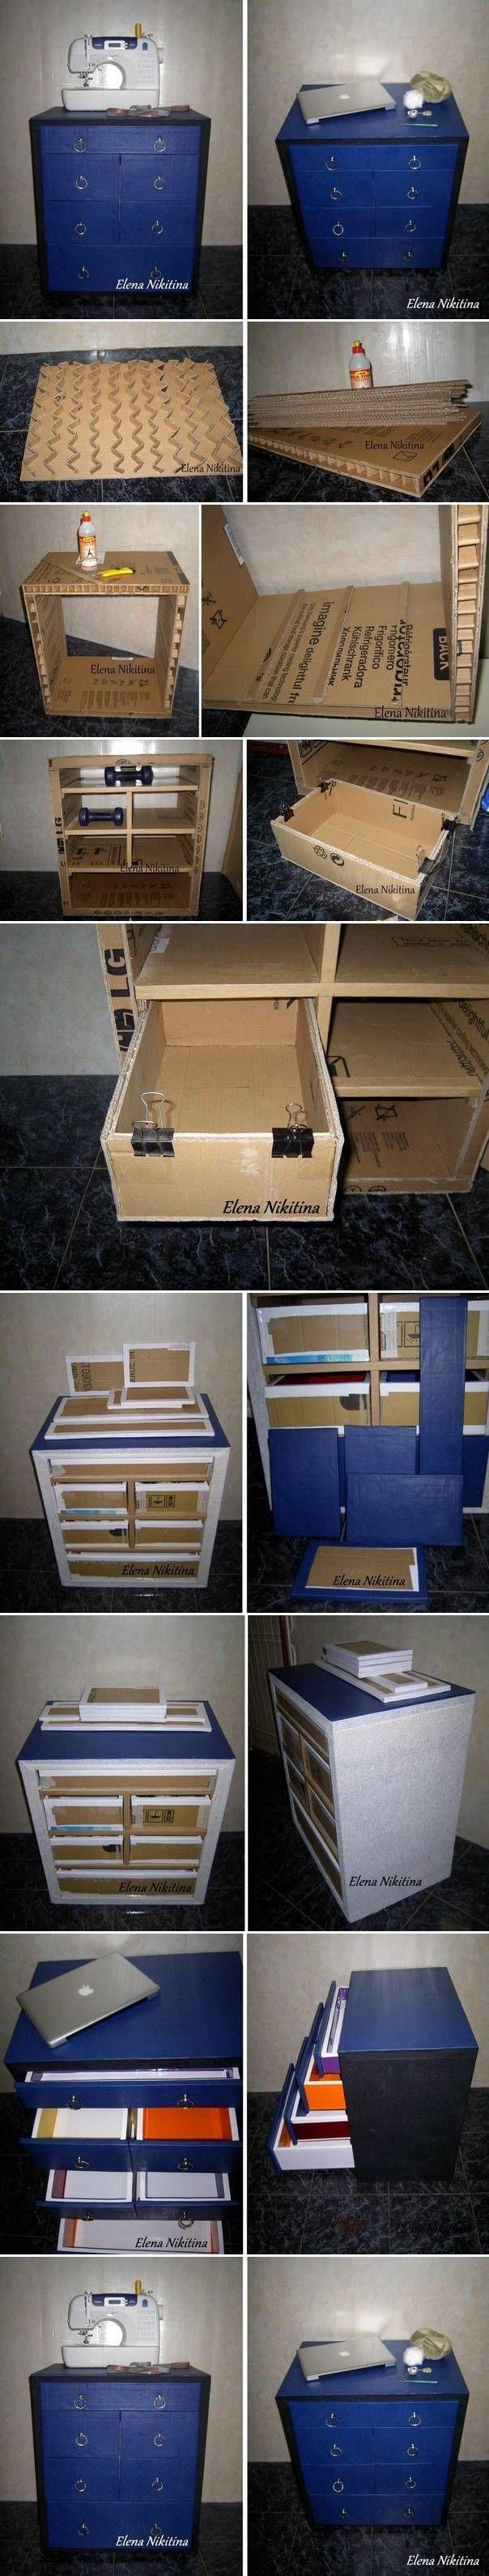 How to make dresser drawers - Diy Cardboard Chest With Drawers Gaveteiro Feito De Papel O